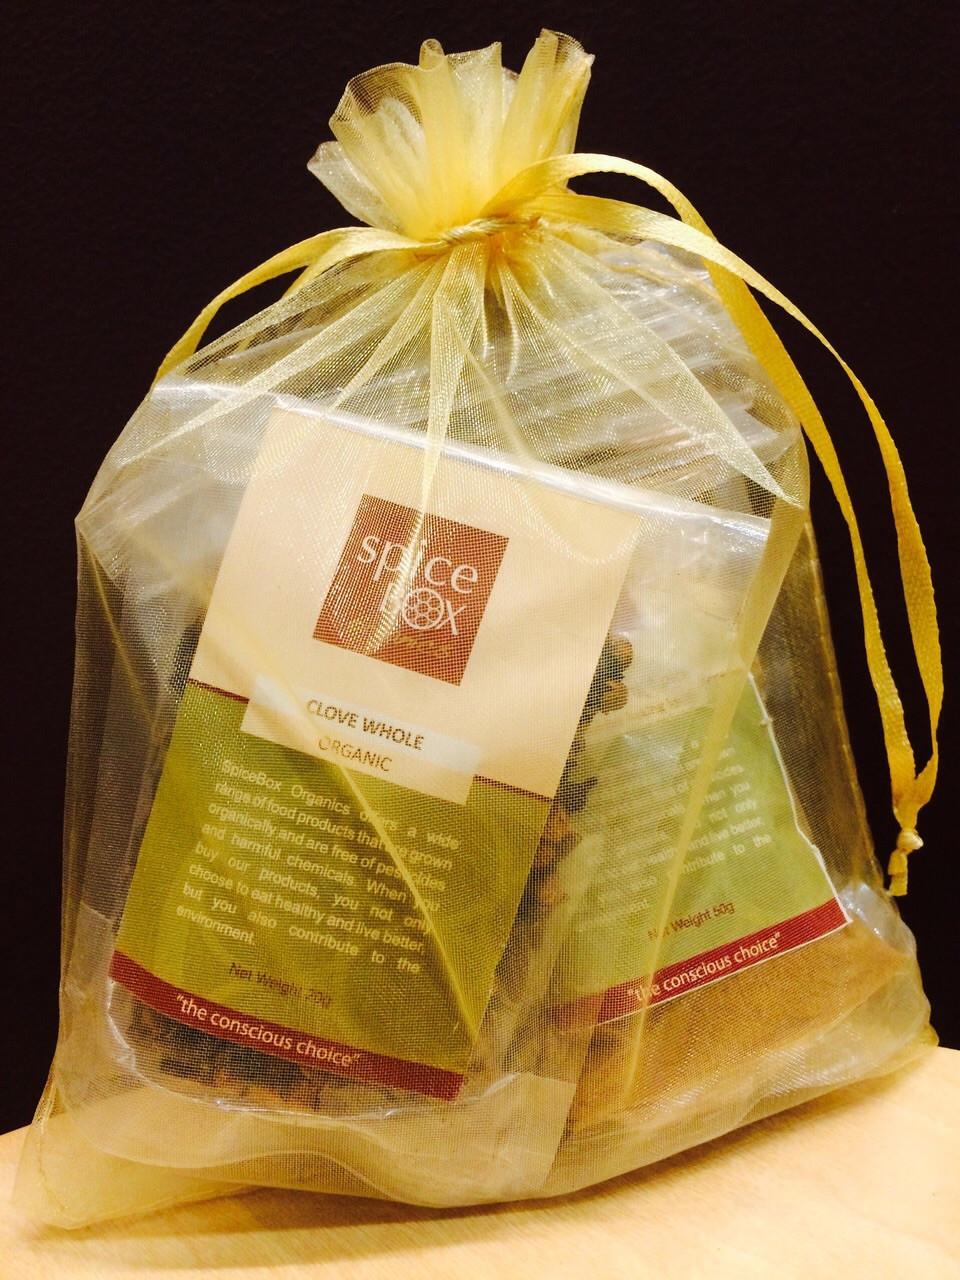 SpiceBox Organics organic baking and festive spices